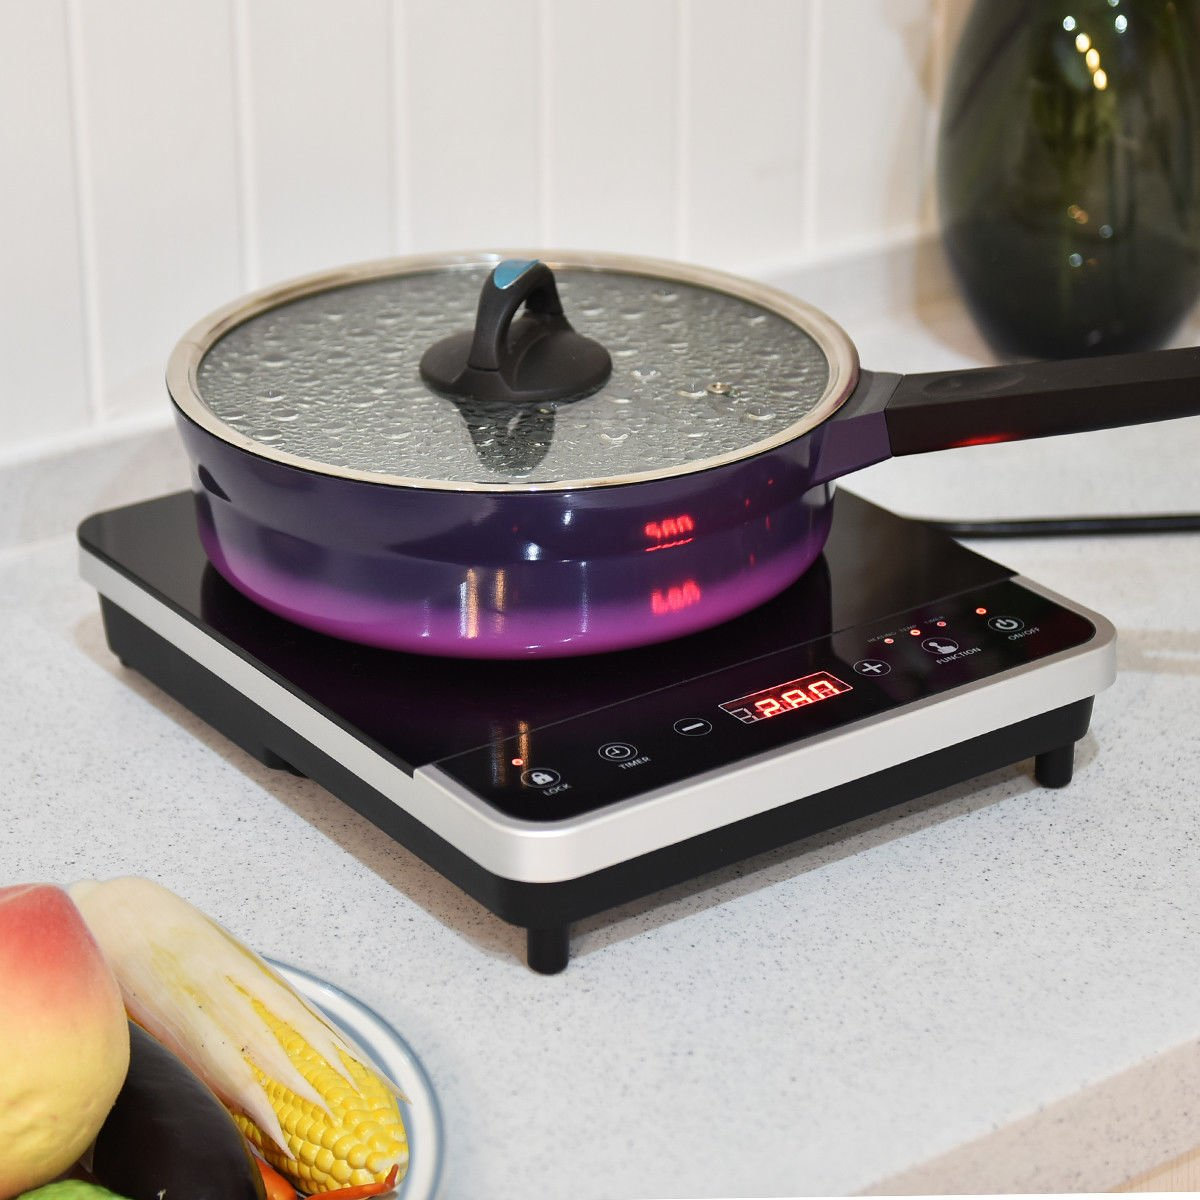 Costway Digital 1800W Induction Cooktop Countertop Burner,Electric Single Burner Hot Plate Cooktop Countertop with Timer,Temperature,Black (1)